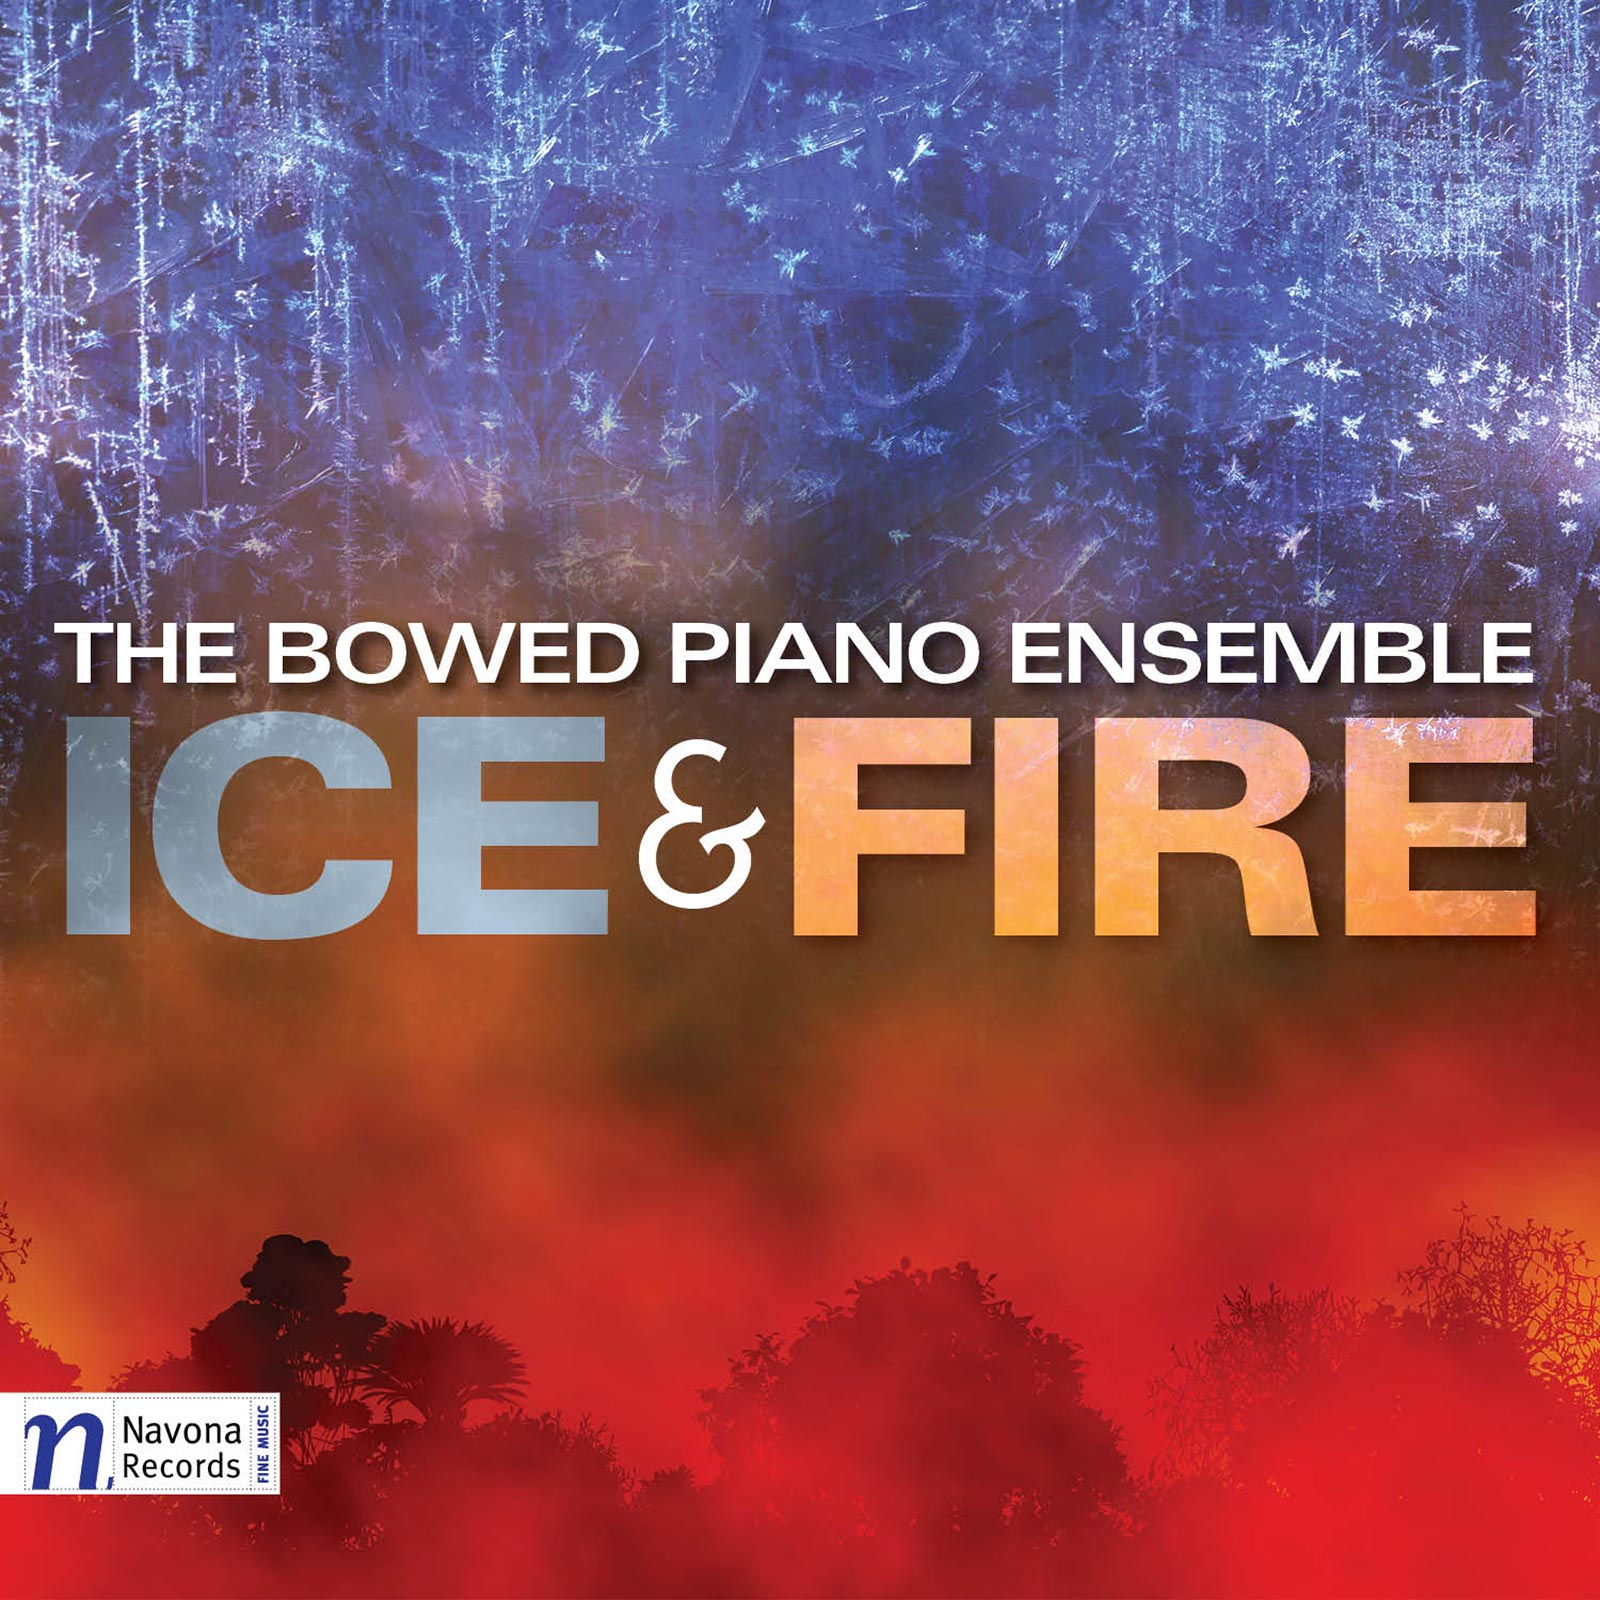 ICE & FIRE - album cover